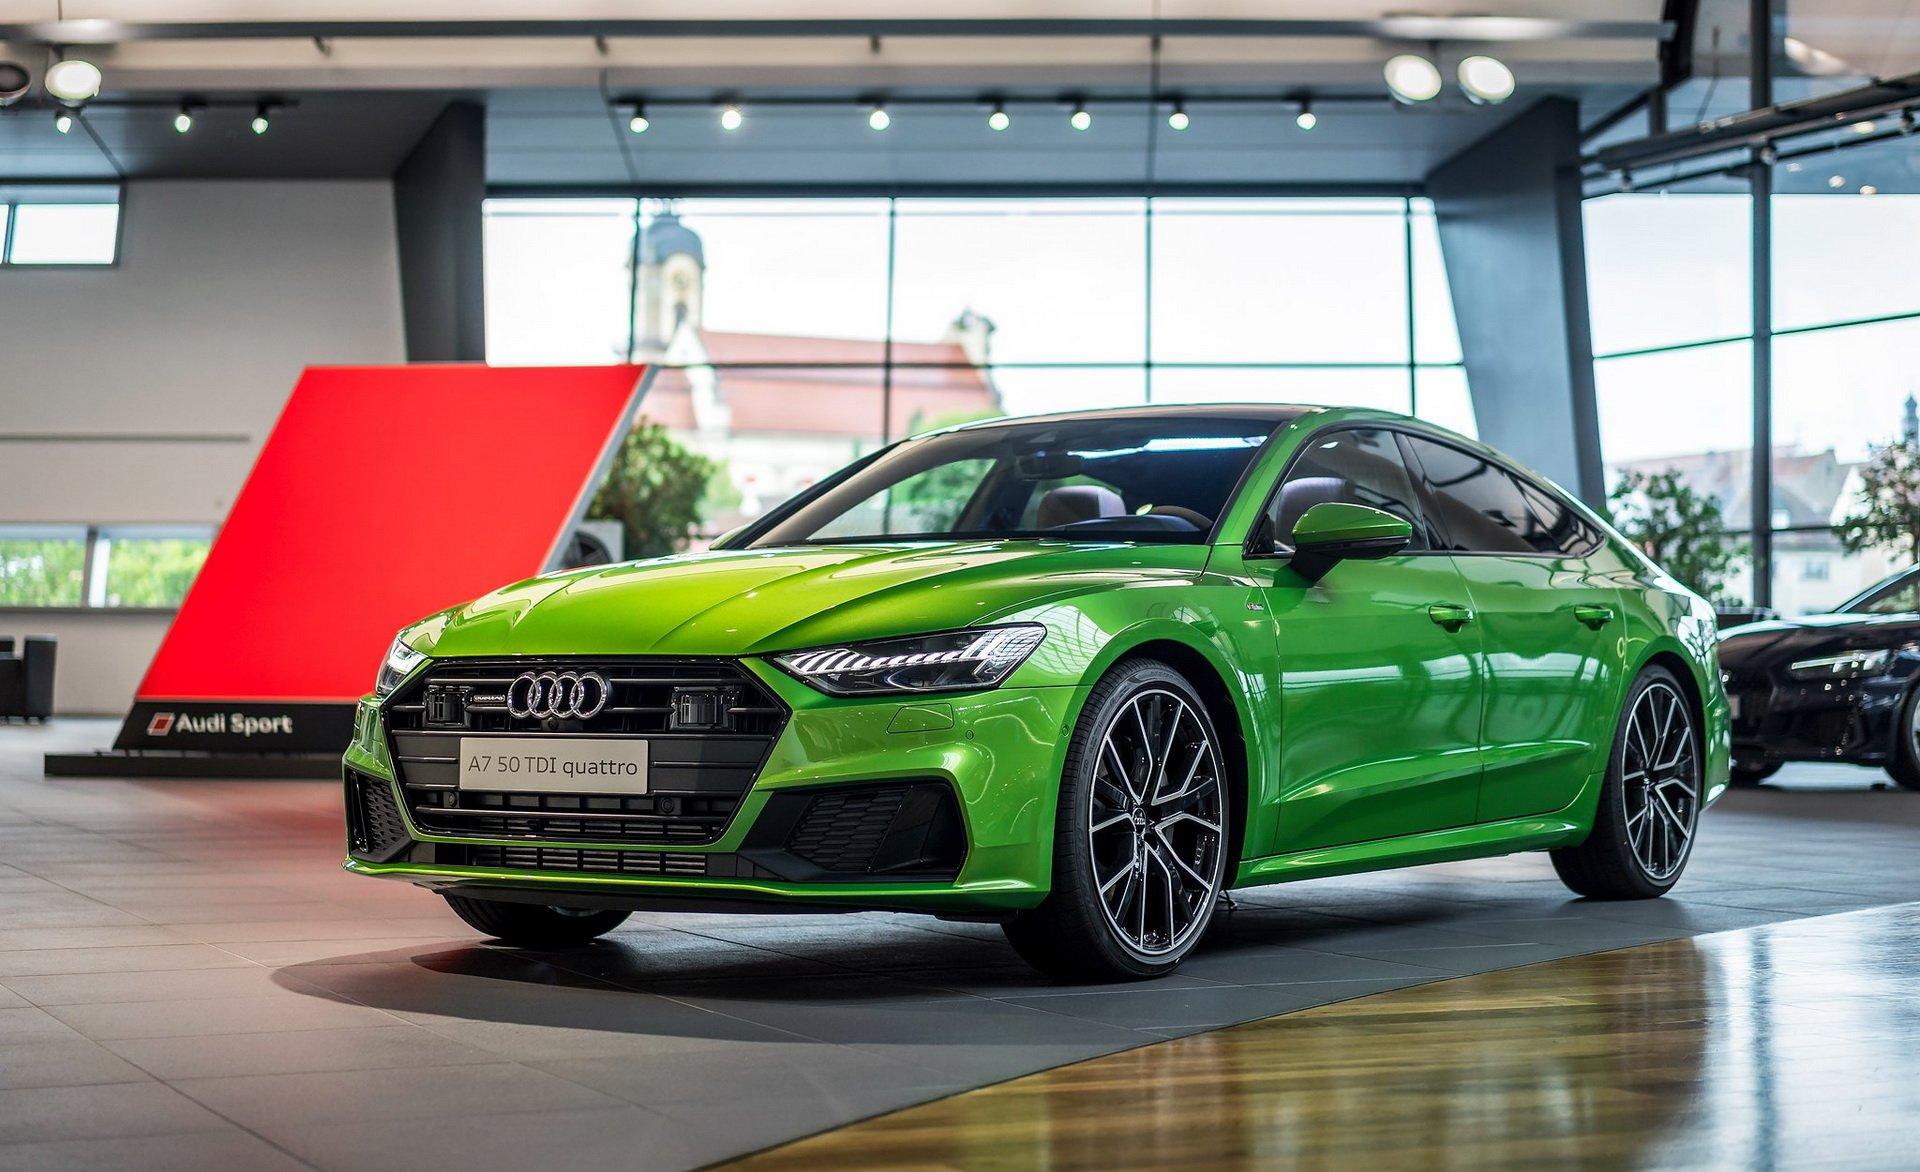 Audi-A7-Sportback-Java-Green-1